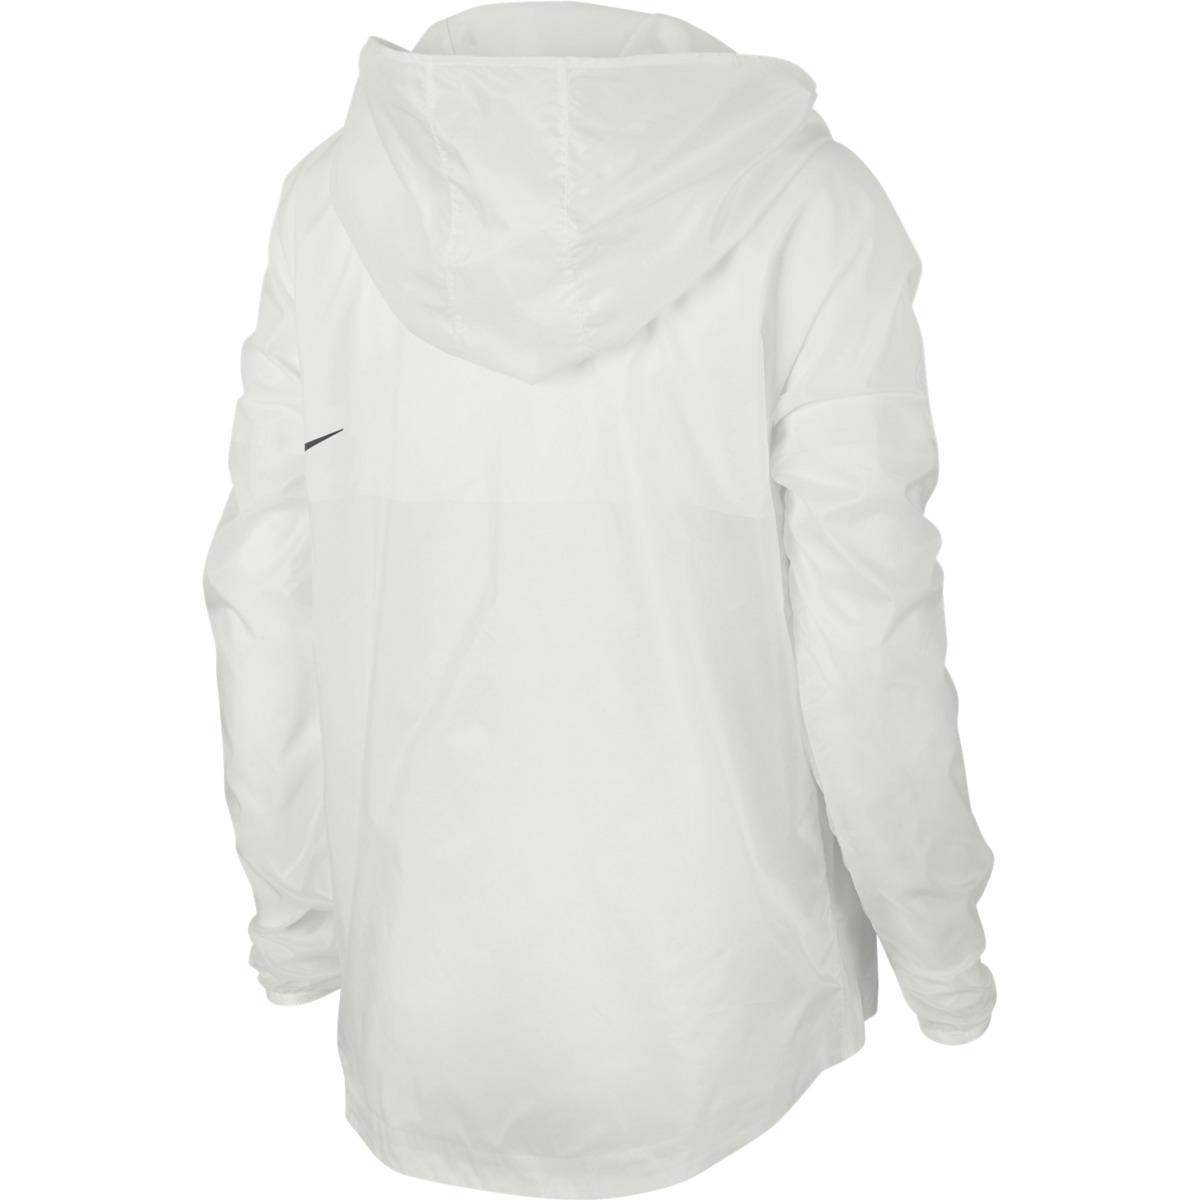 d07bf47c9a53 Nike - White Tech Windcheater Jacket - Lyst. View fullscreen